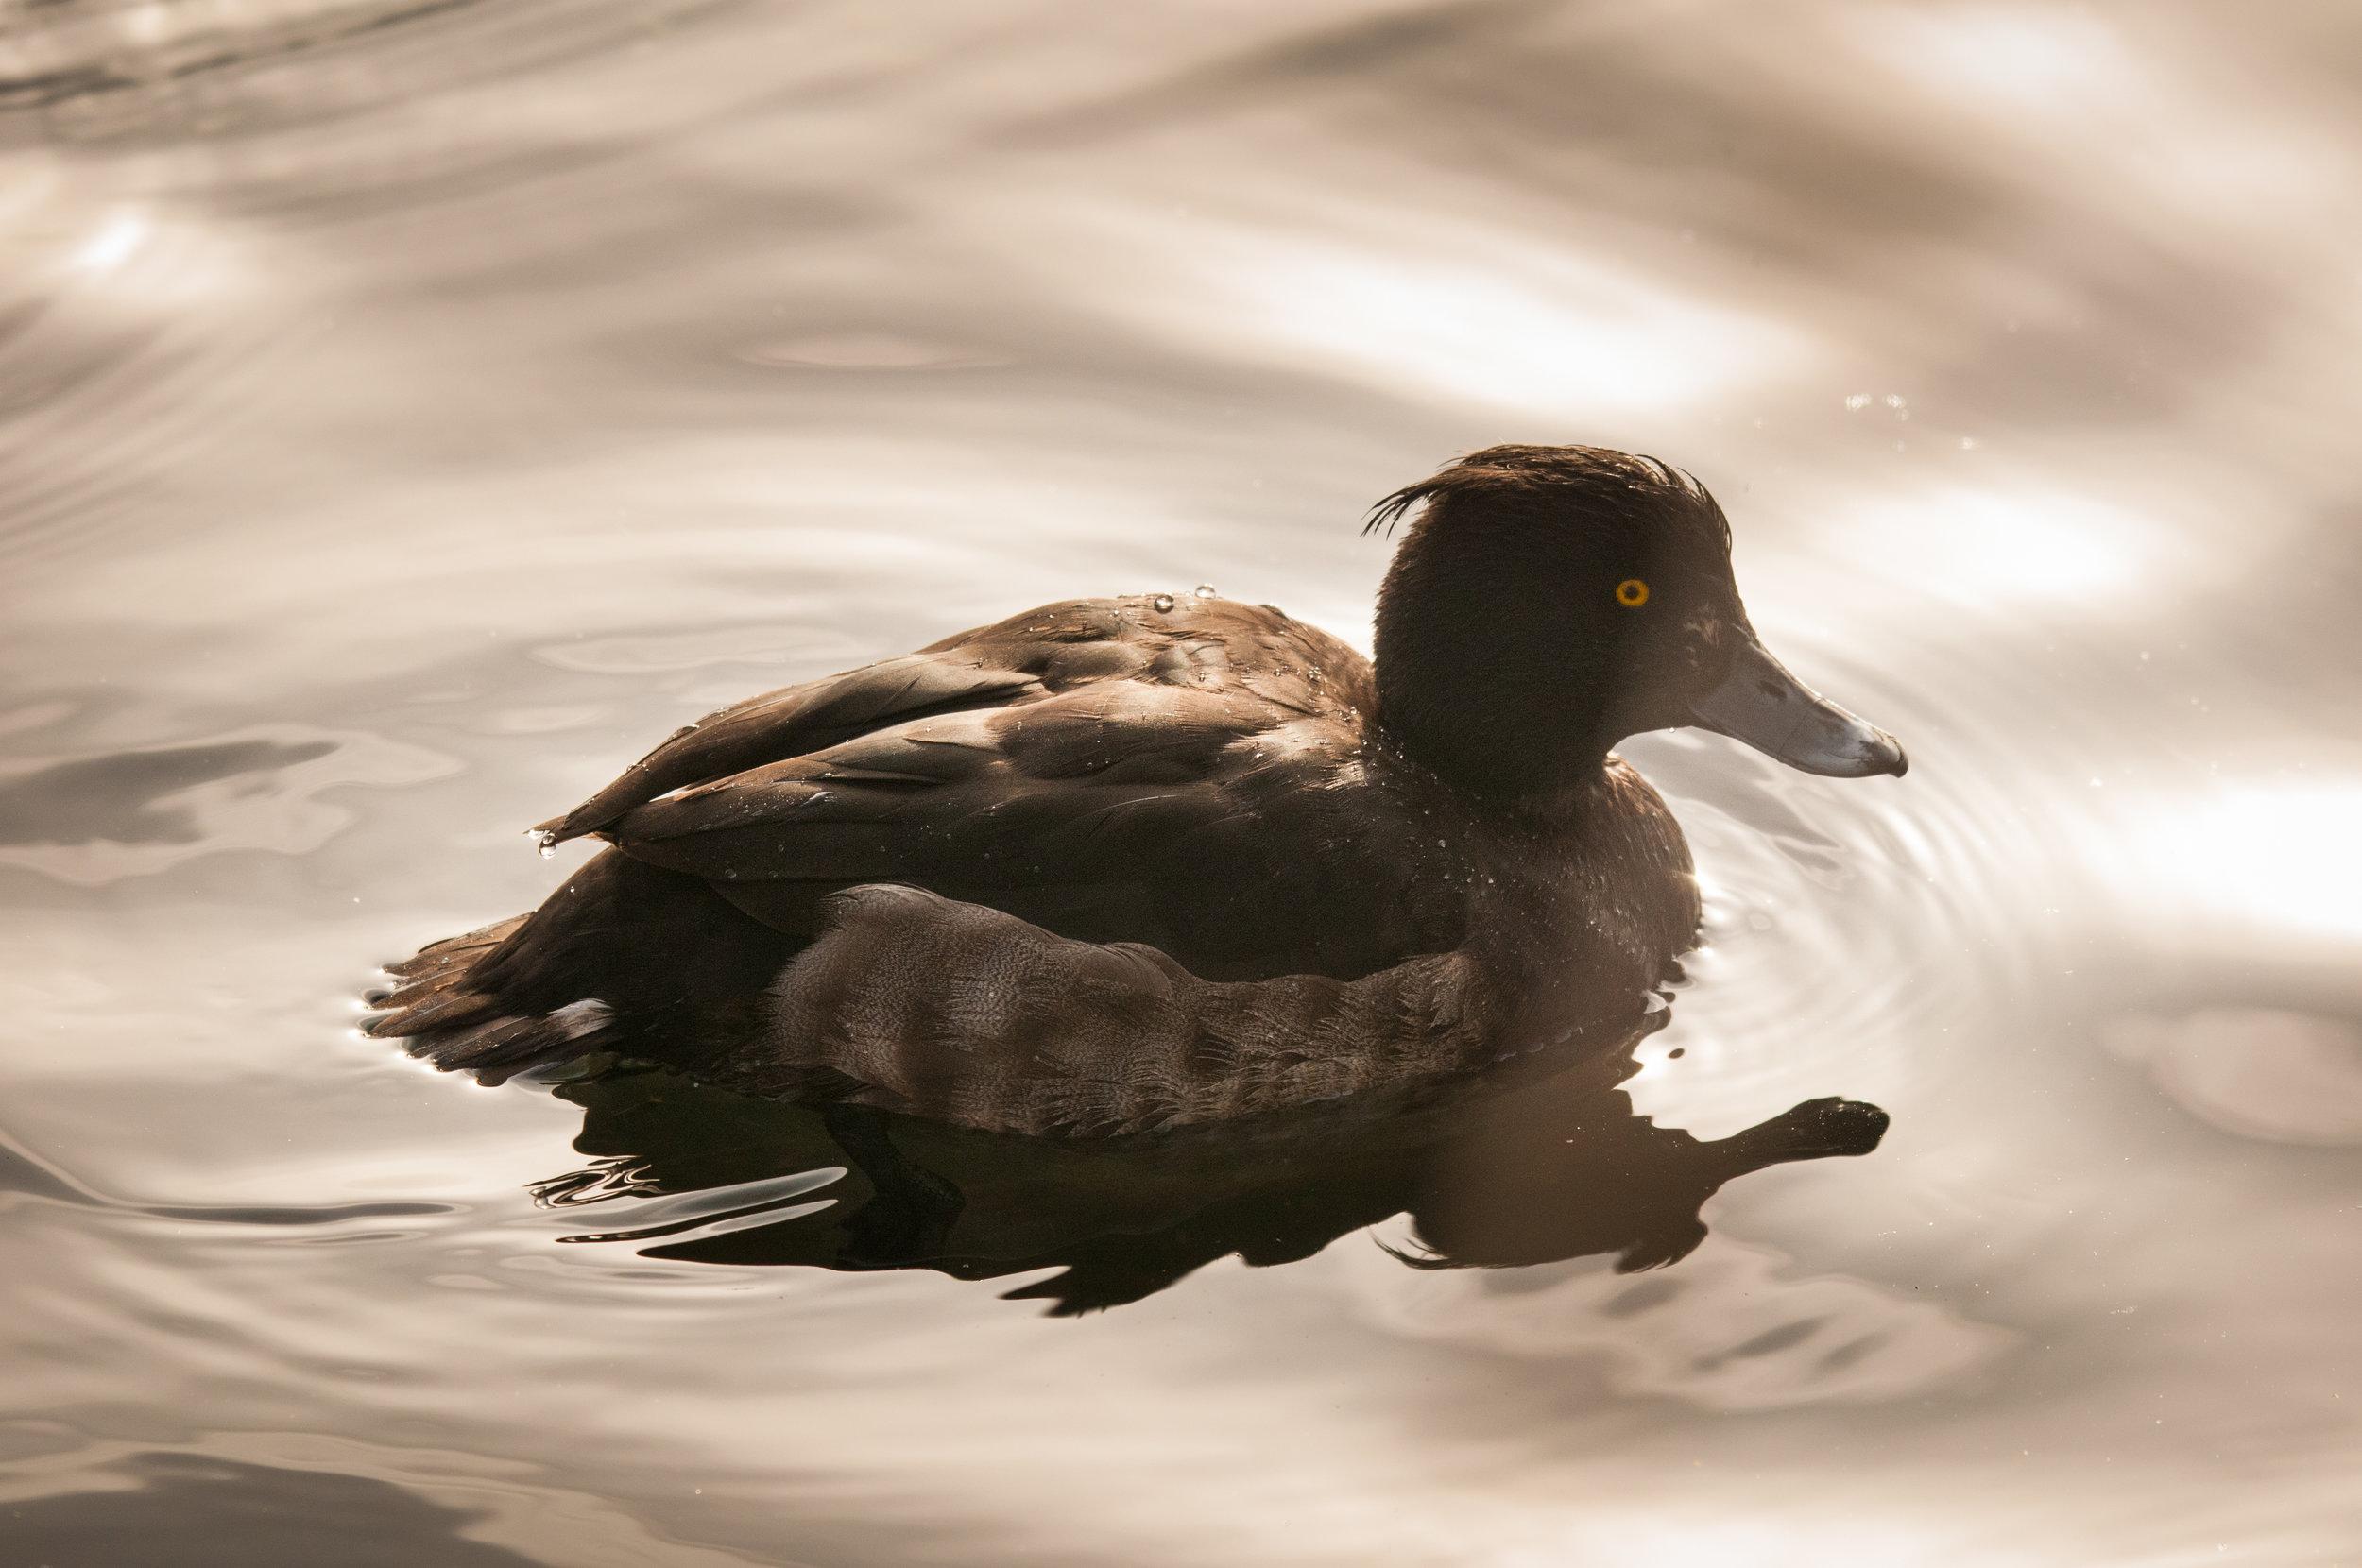 Ptaki Lochend - 2019 - MAR_4582.jpg